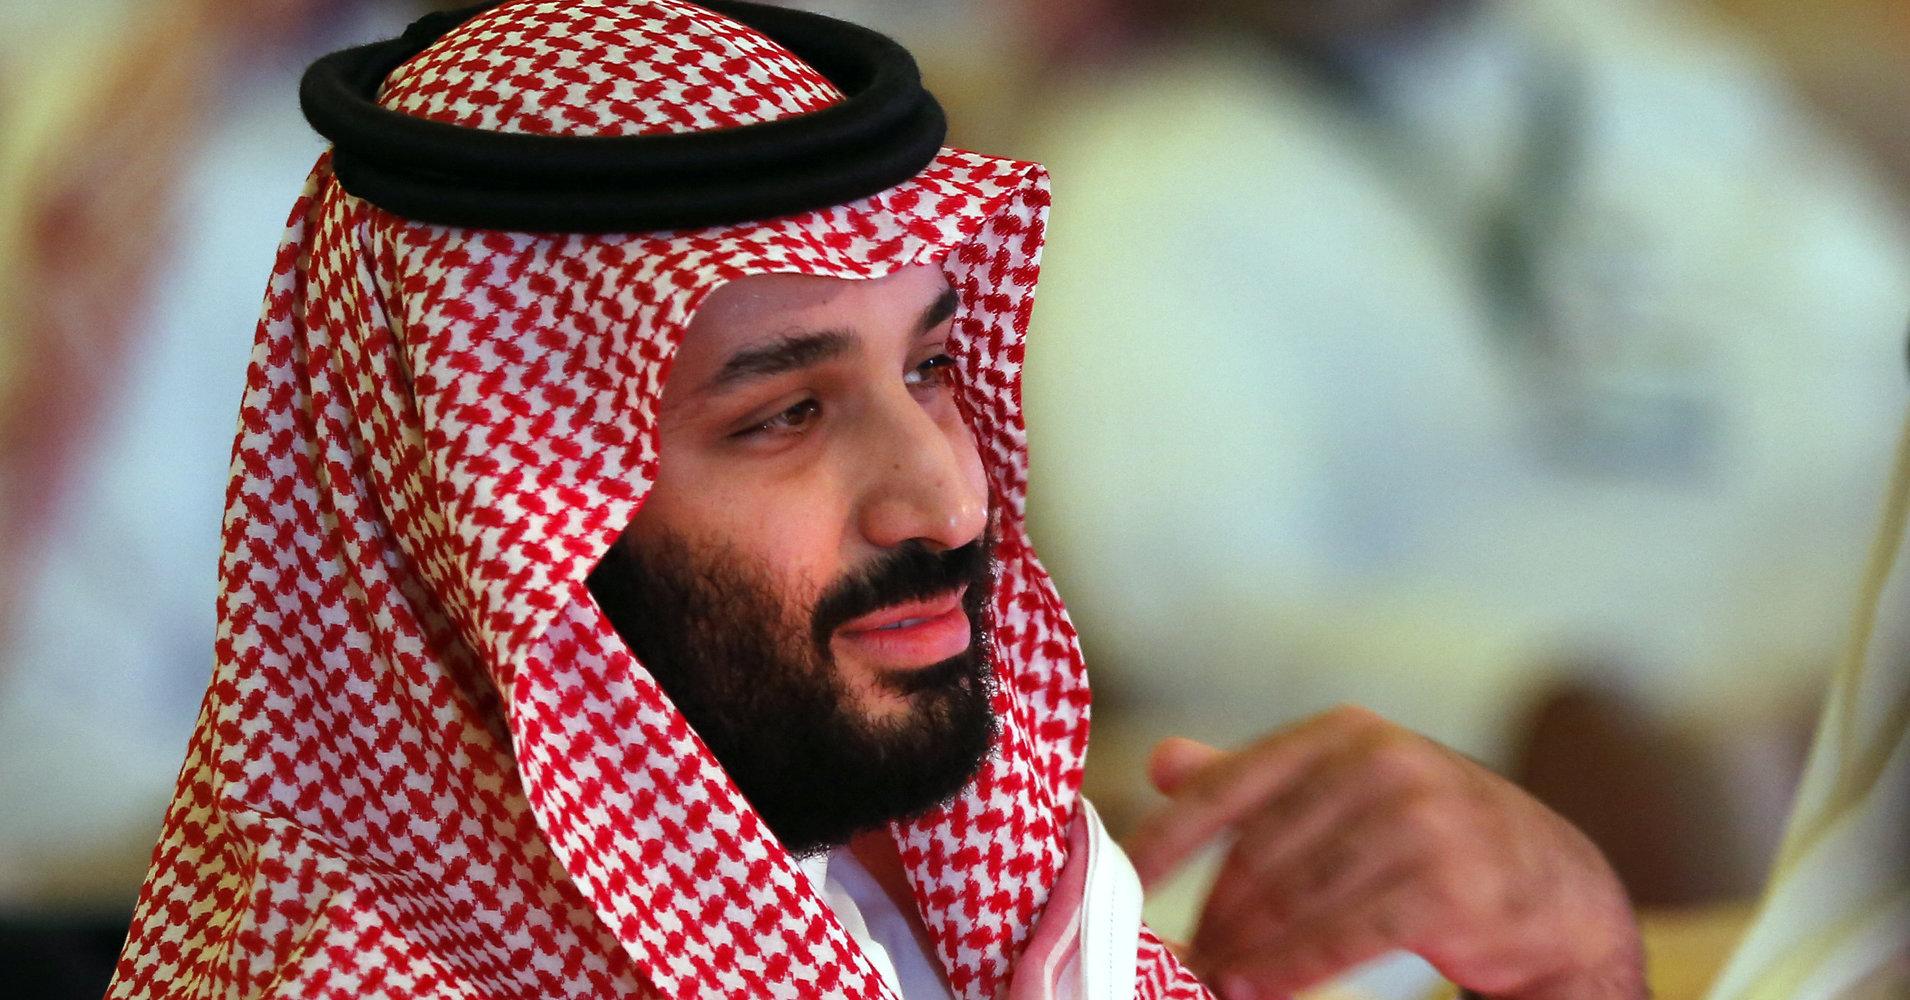 After Khashoggi, Mohammed Bin Salman Looks To Rebuild Image Abroad